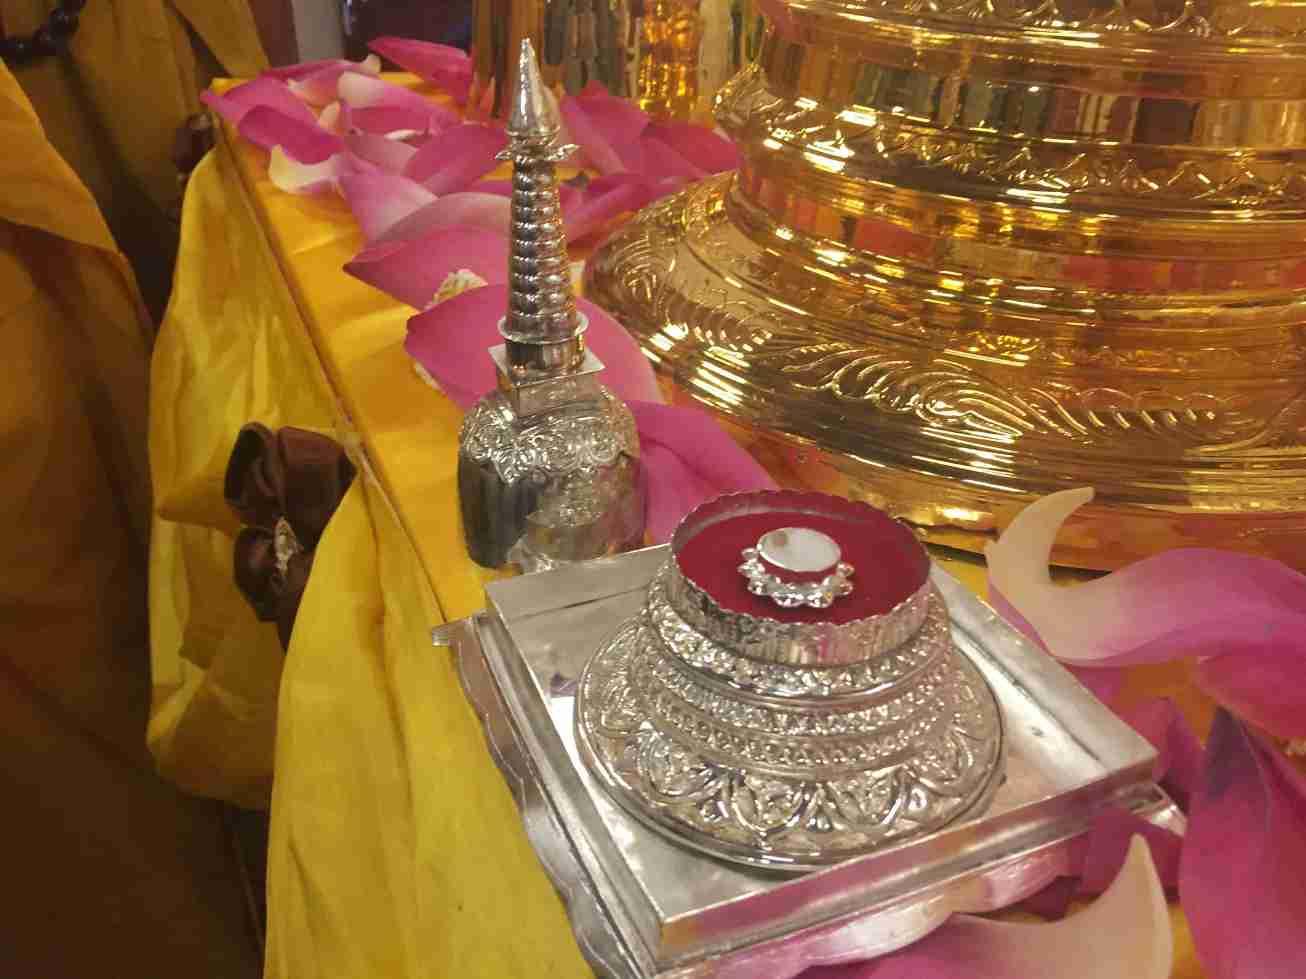 Image 01- Sacred Relic of Lord Buddha